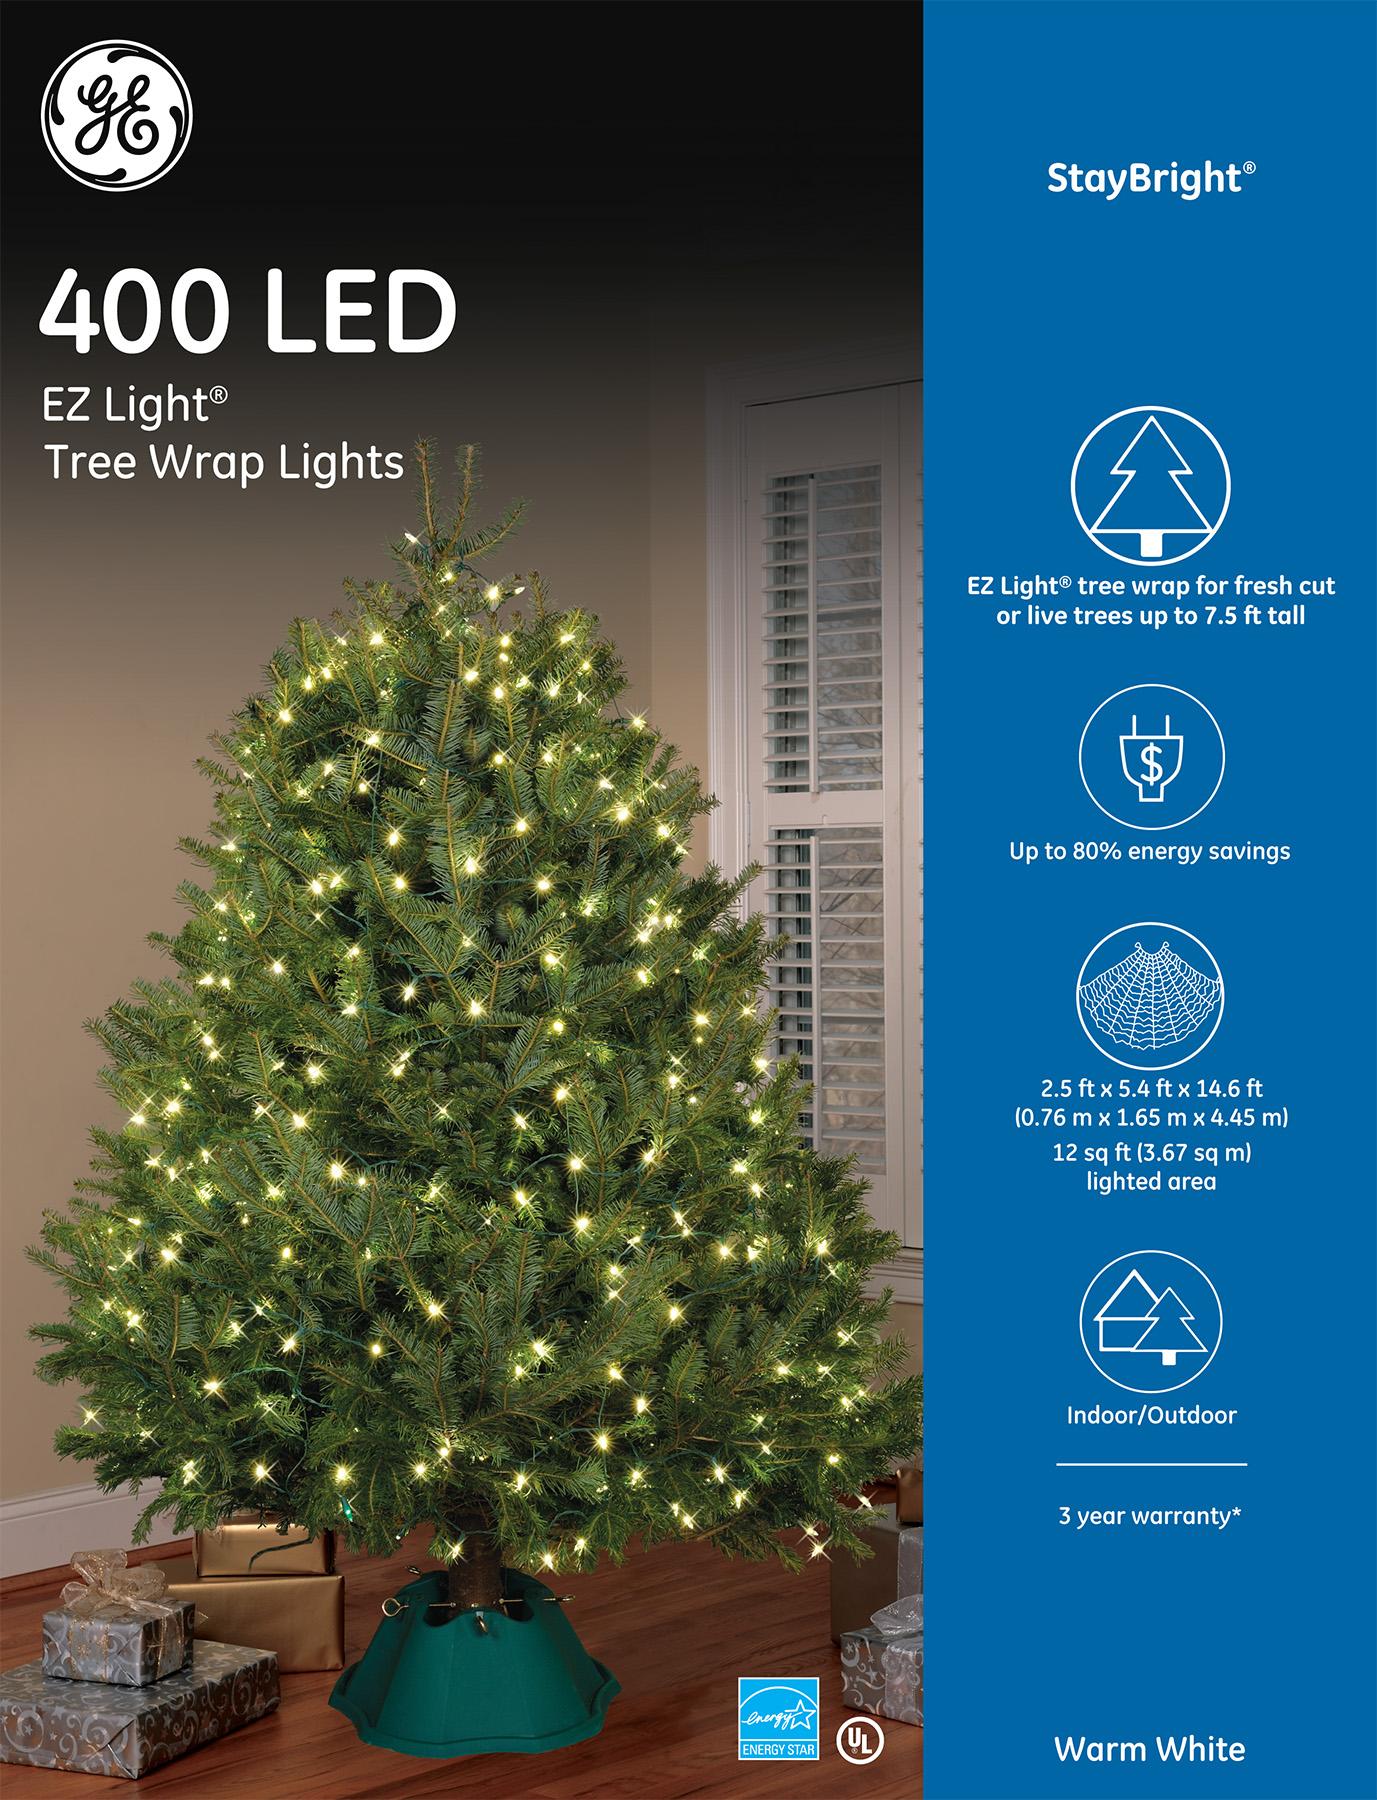 Ge Christmas Tree Lights.91076 Ge Staybright Led Ez Light Tree Wrap Lights 400ct